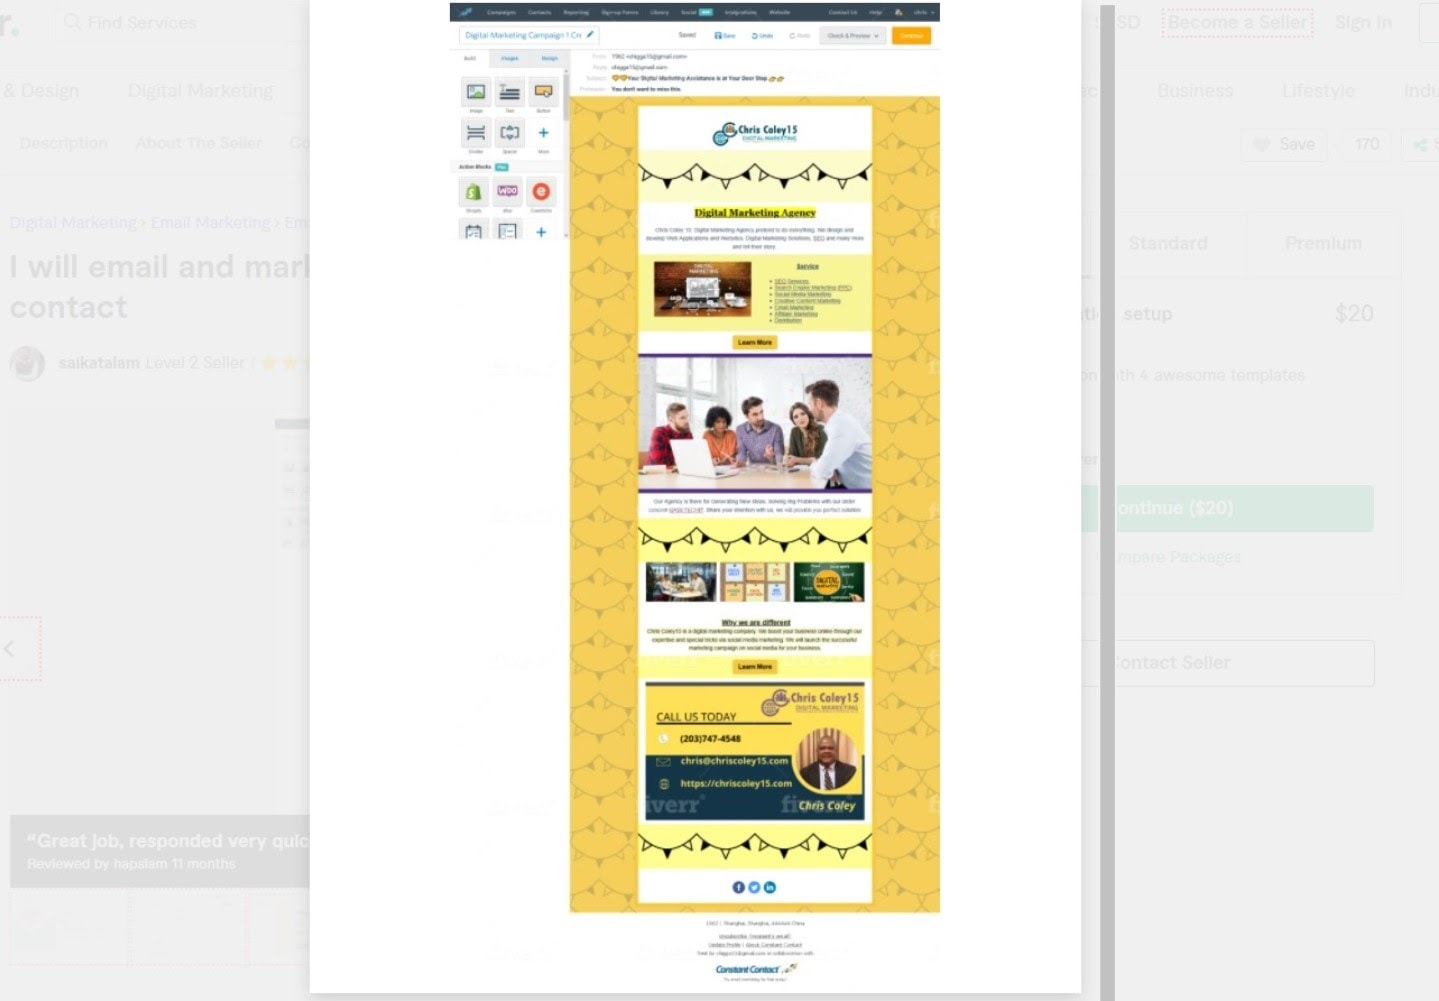 Saikatalam Constant Contact template example